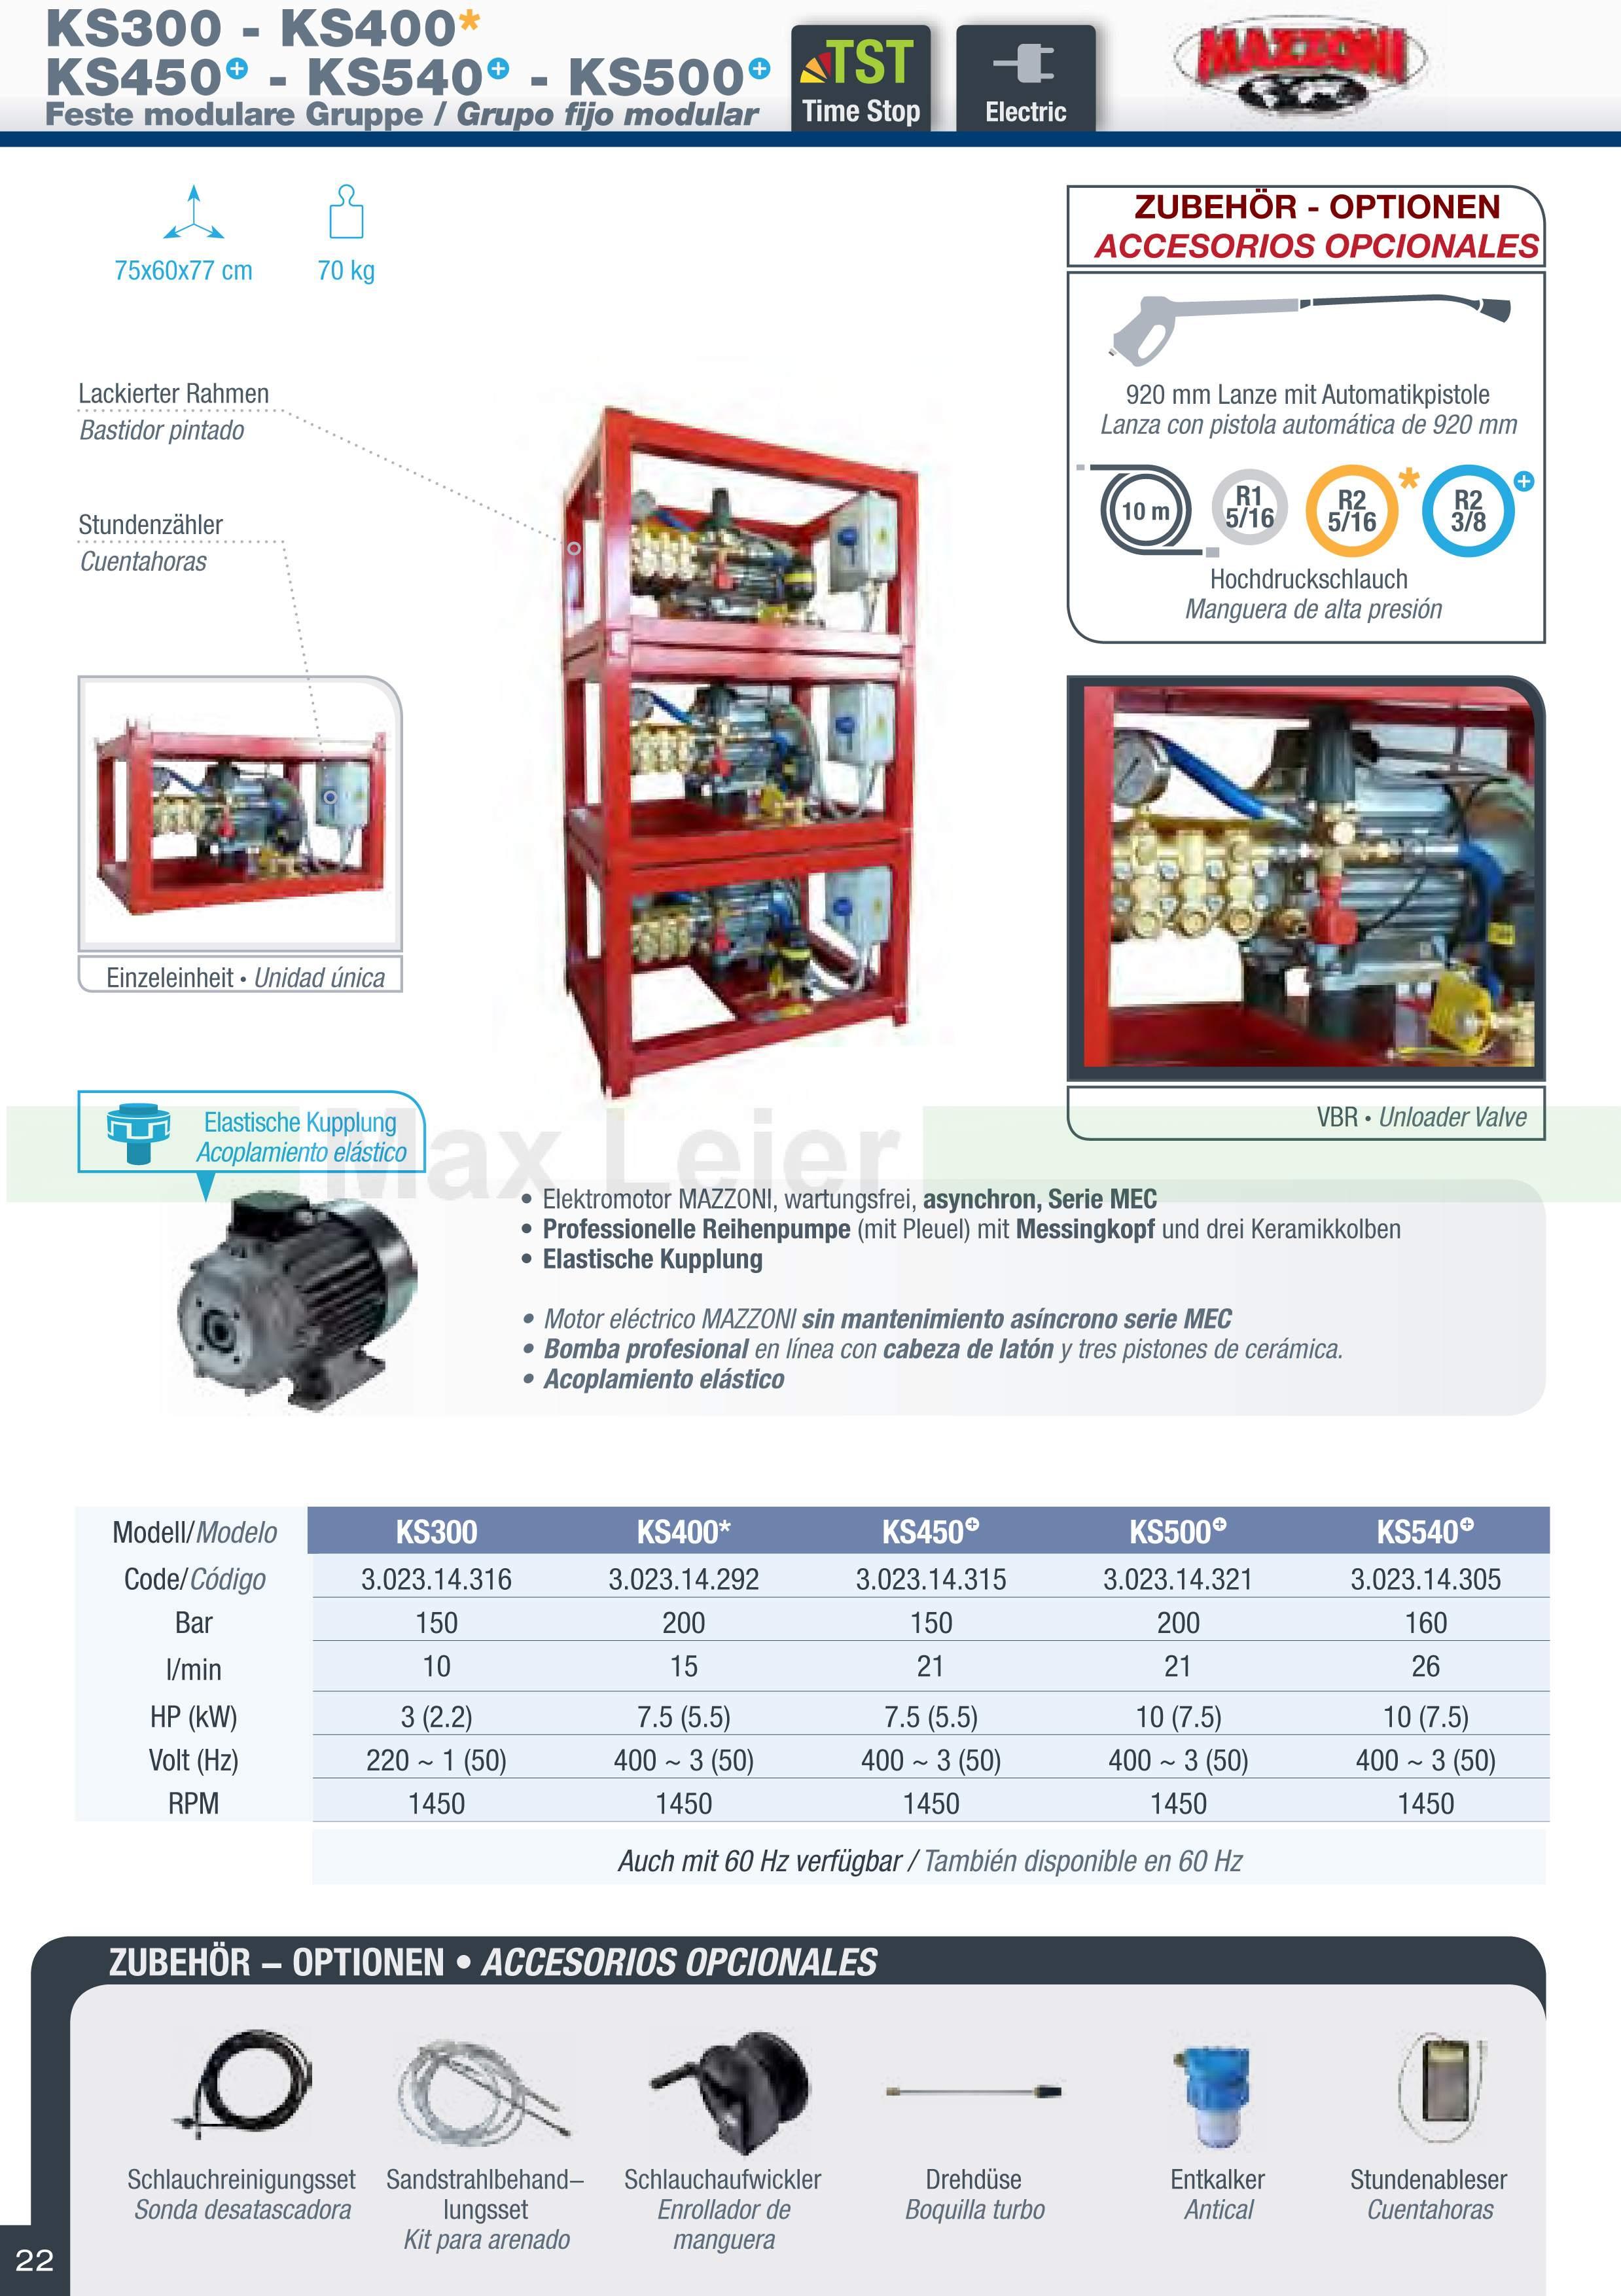 S22-Mazzoni-KS300-KS400-KS450-KS540-KS500